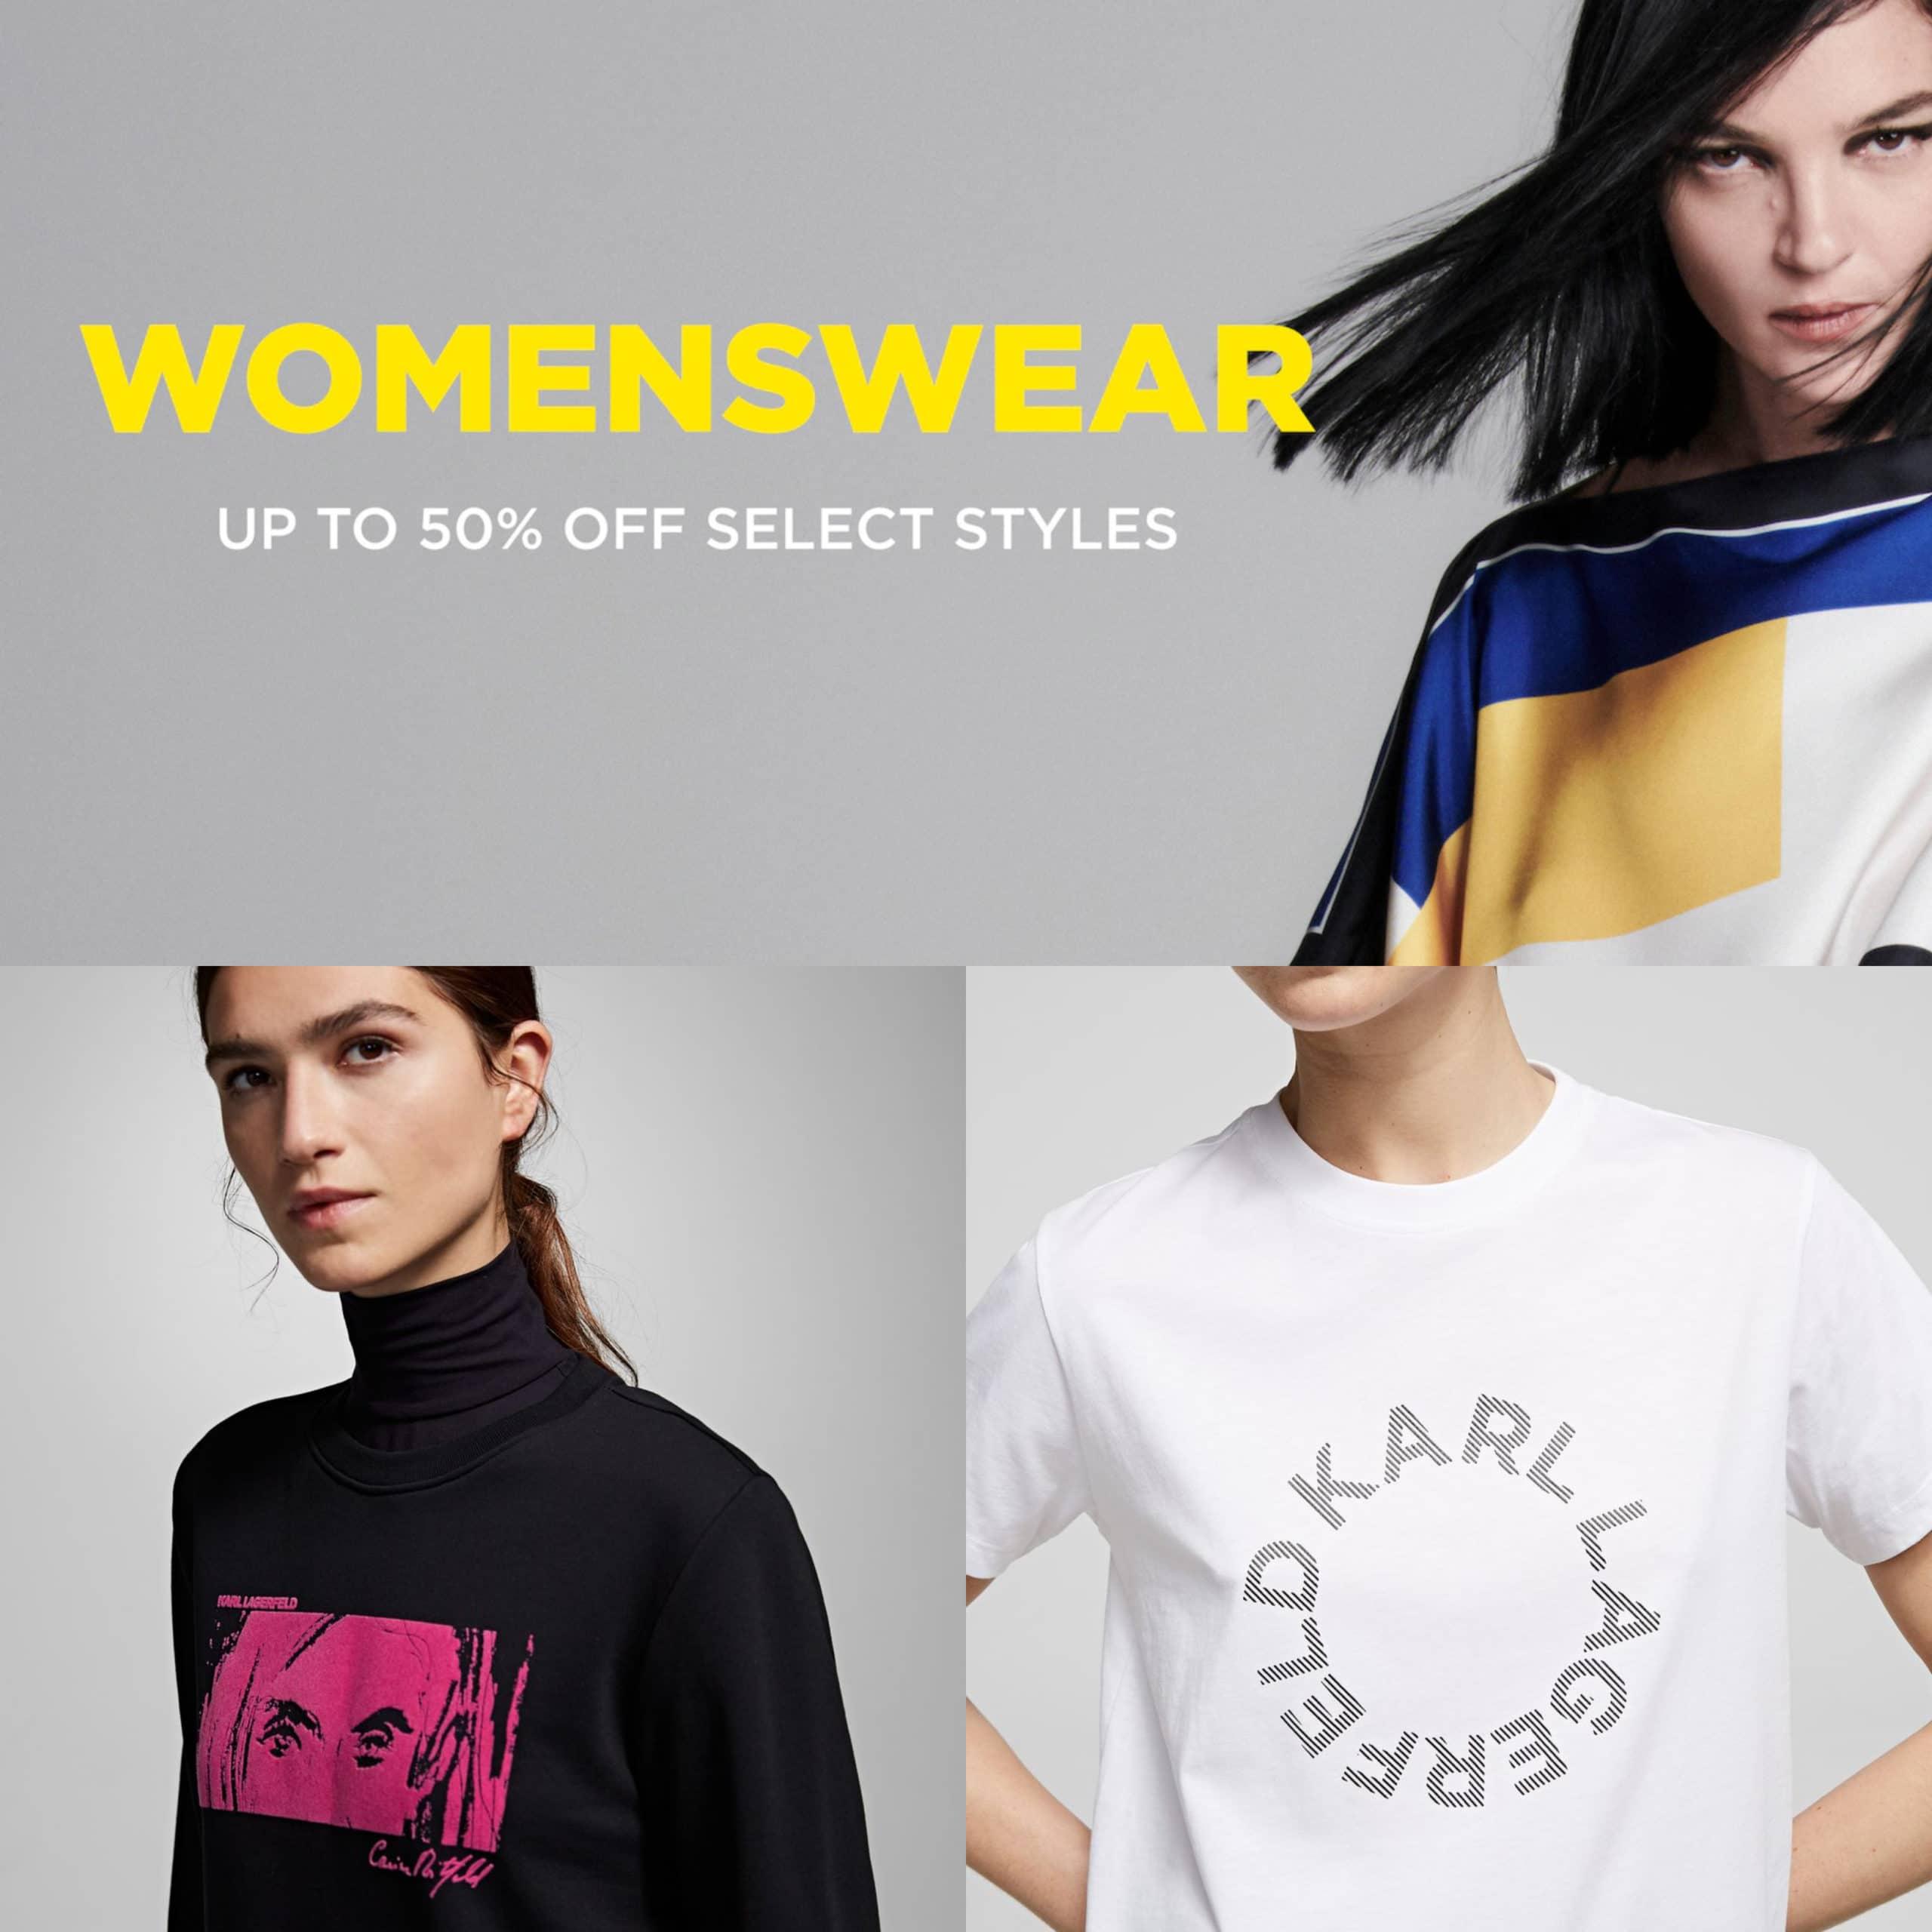 Karl Lagerfeld brand Summer 2020 collection